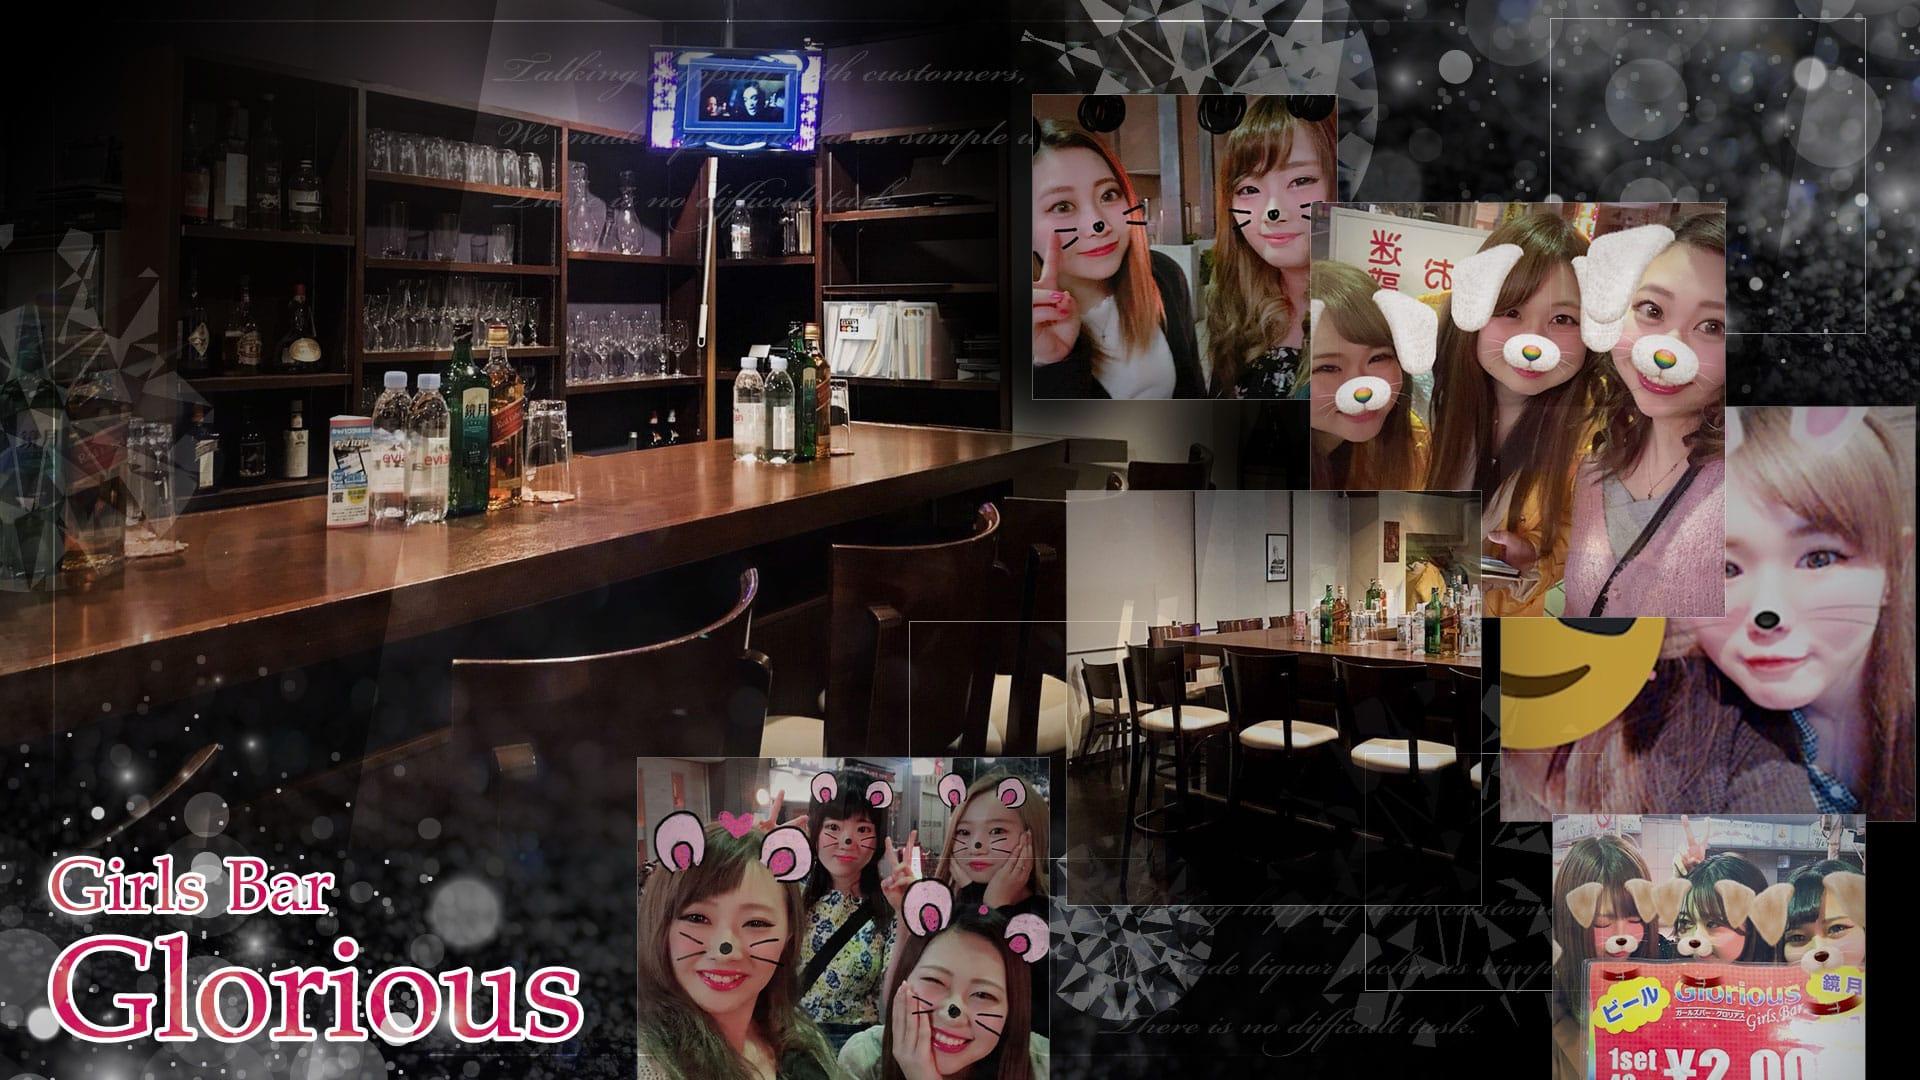 Girls Bar Glorious(グロリアス) 船橋ガールズバー TOP画像